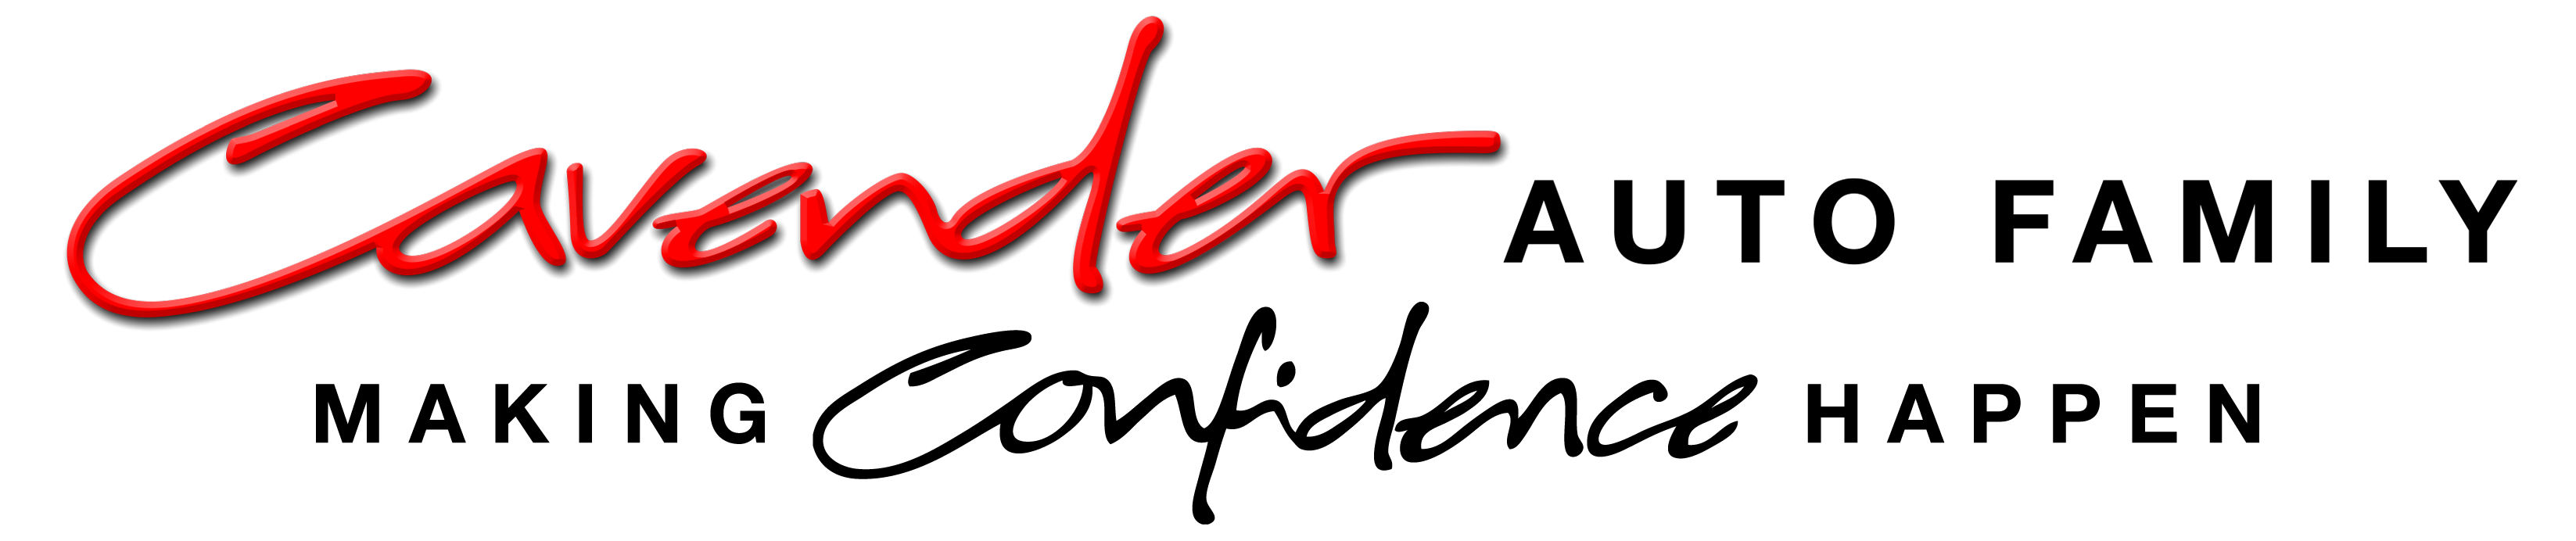 Cavender Auto Family logo